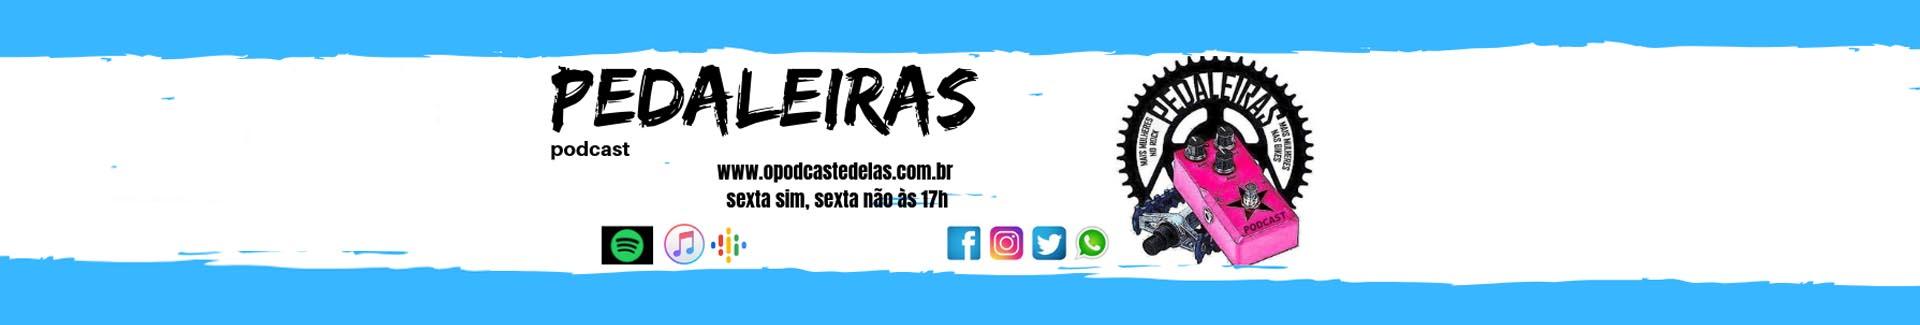 banner-pedalada